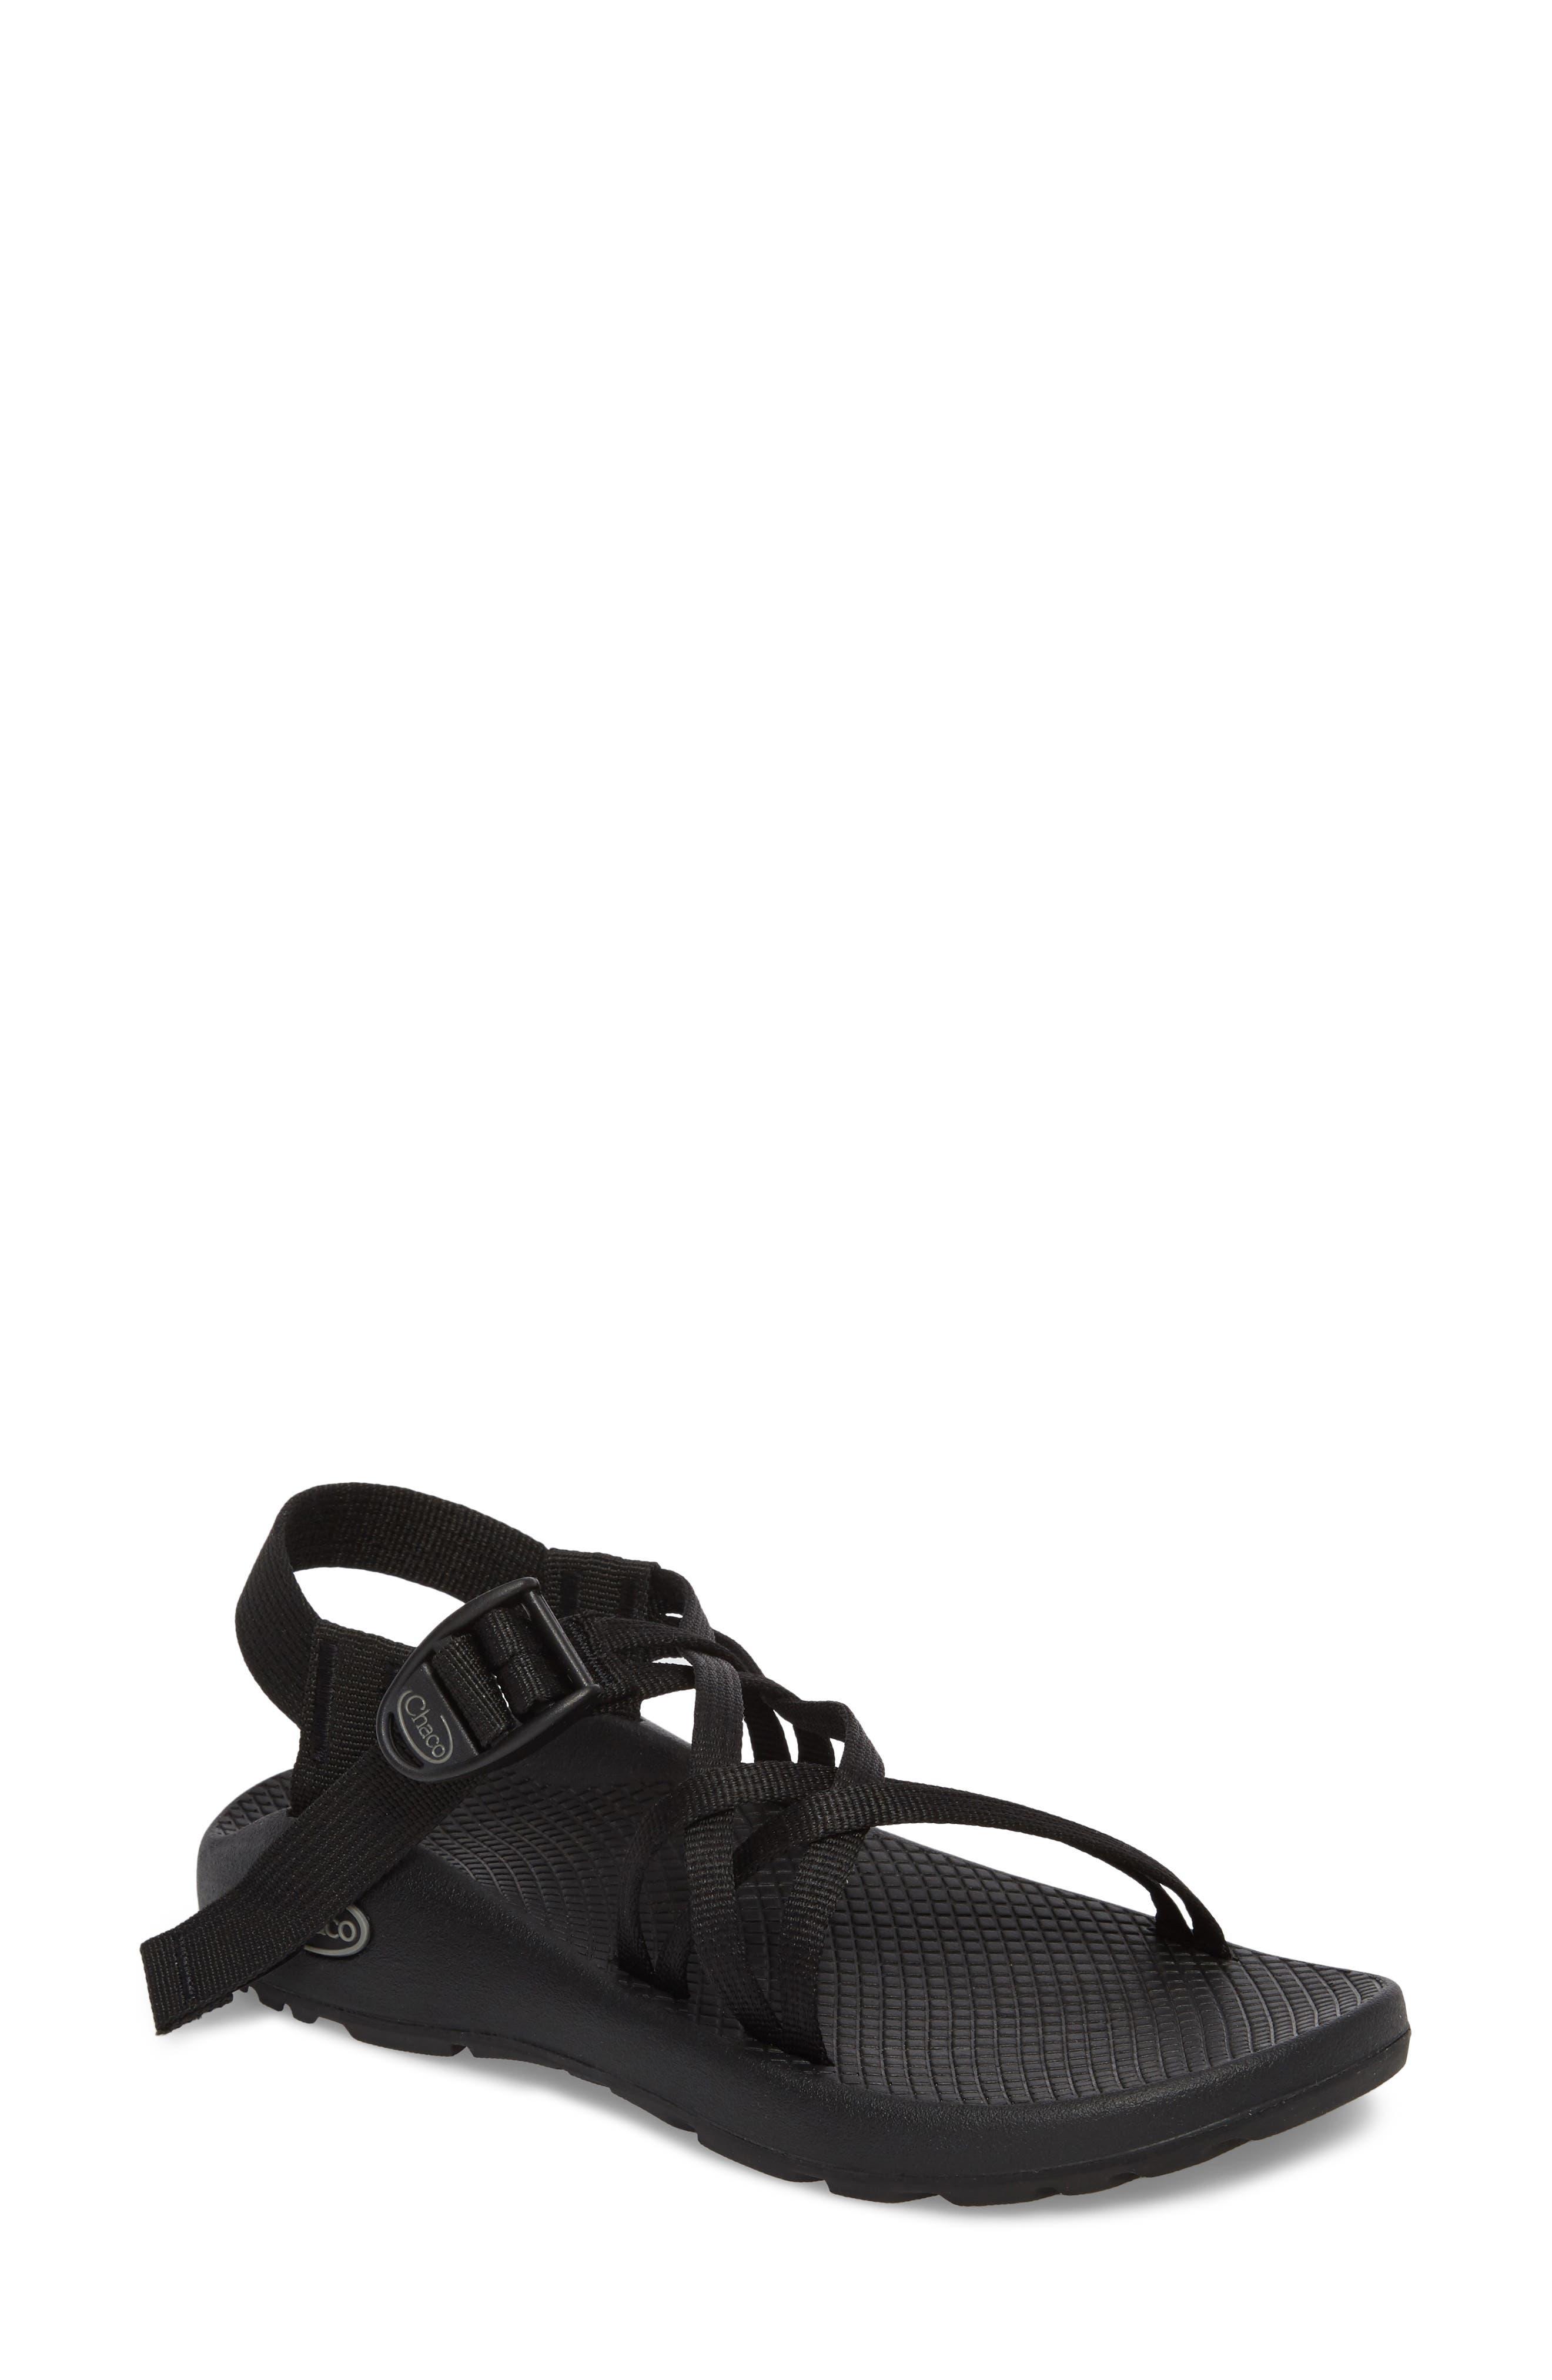 ZX1 Classic Sport Sandal,                             Main thumbnail 1, color,                             BLACK